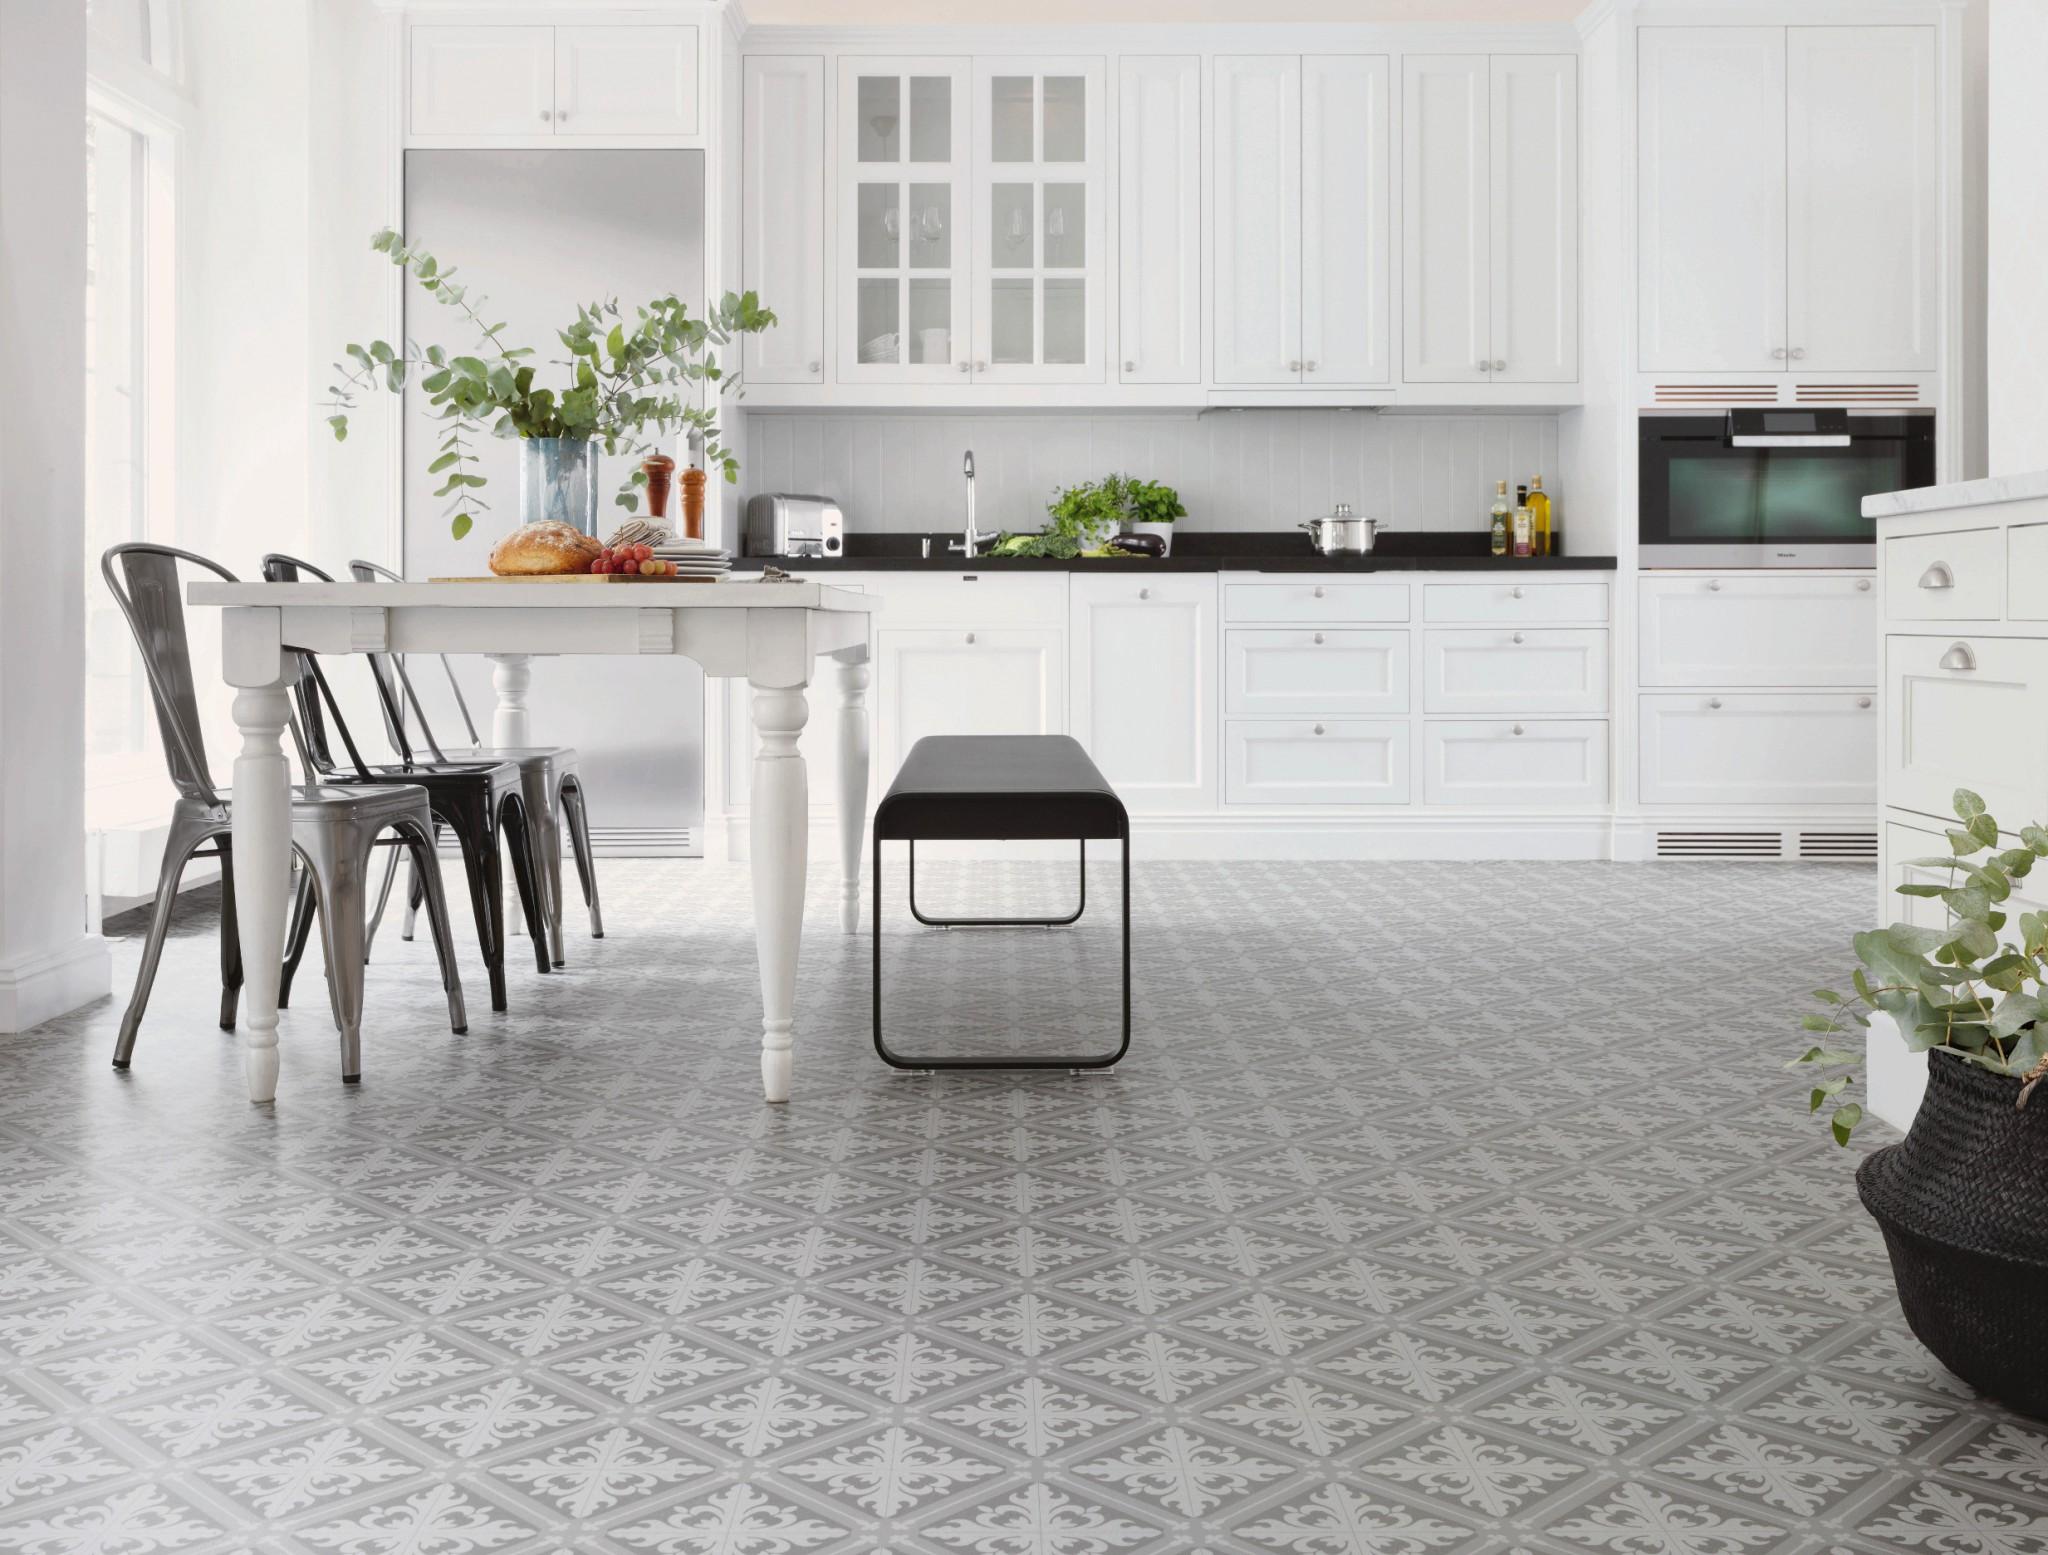 slik velger du riktig gulv hjemme rom123. Black Bedroom Furniture Sets. Home Design Ideas